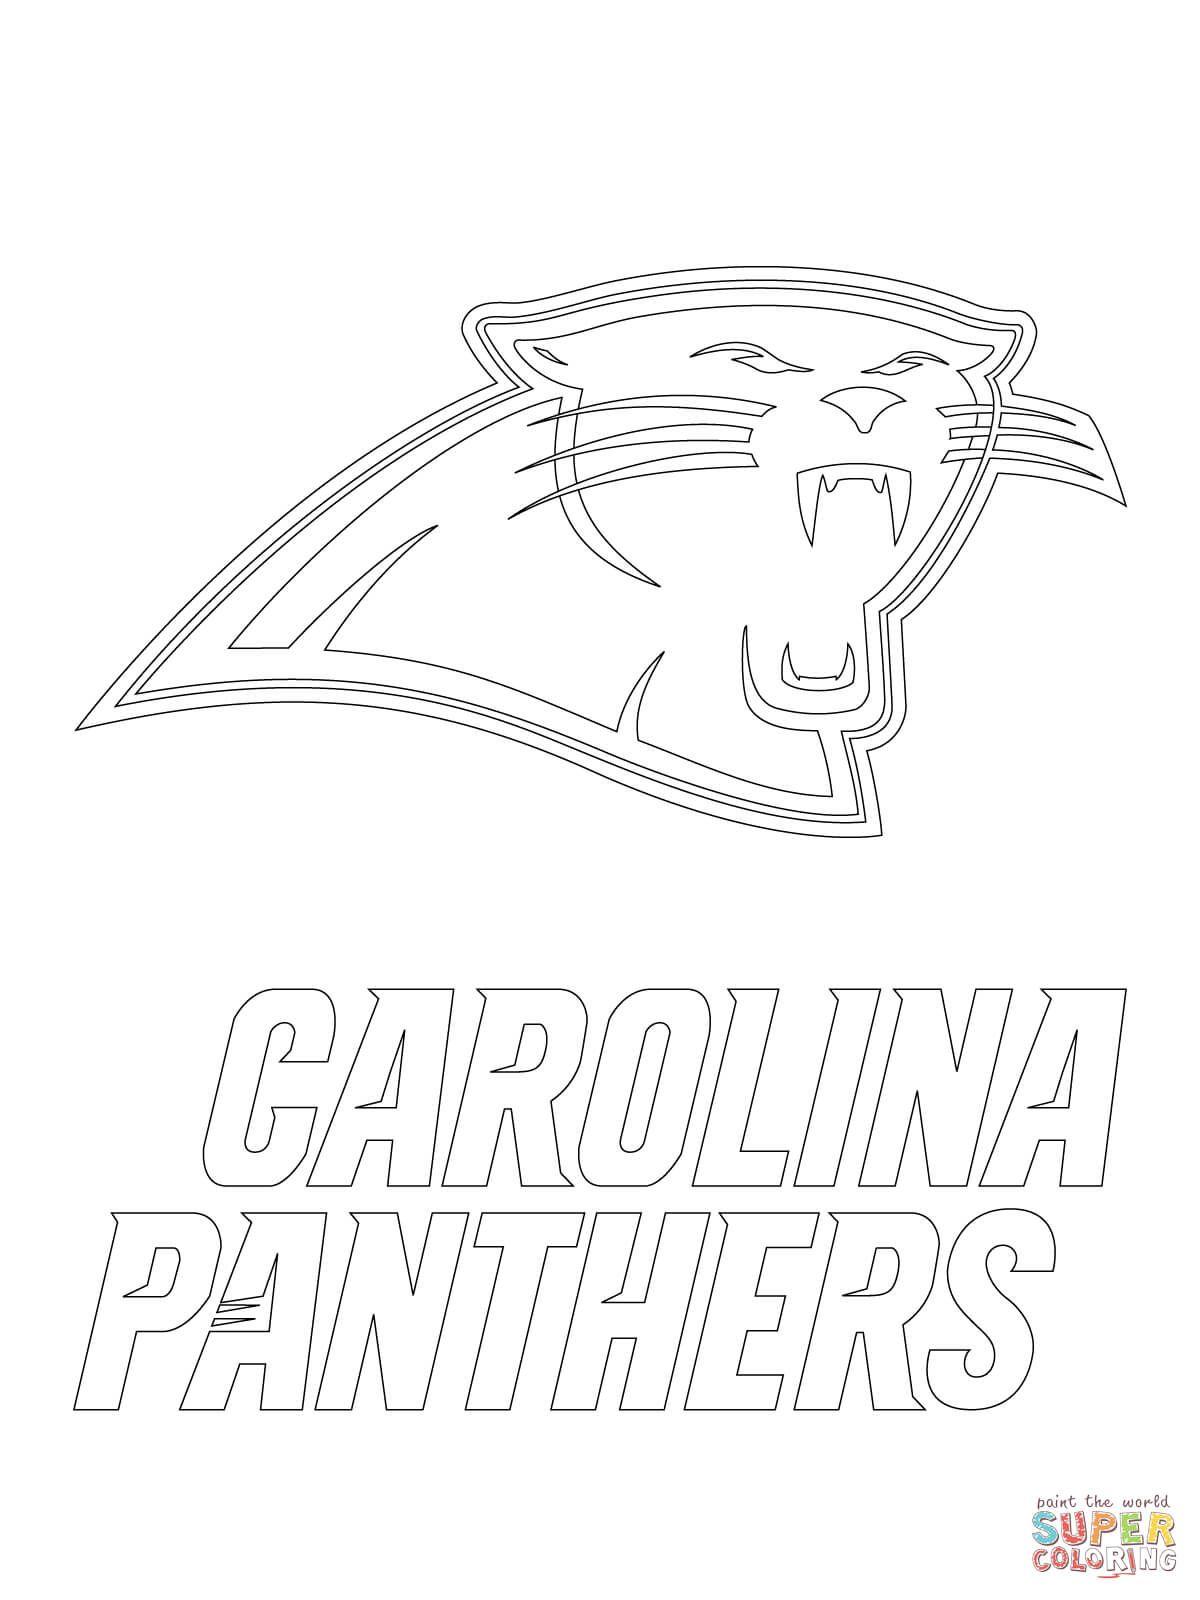 carolina panthers coloring pages Pin by julia on Colorings | Coloring pages, Panthers, Football carolina panthers coloring pages